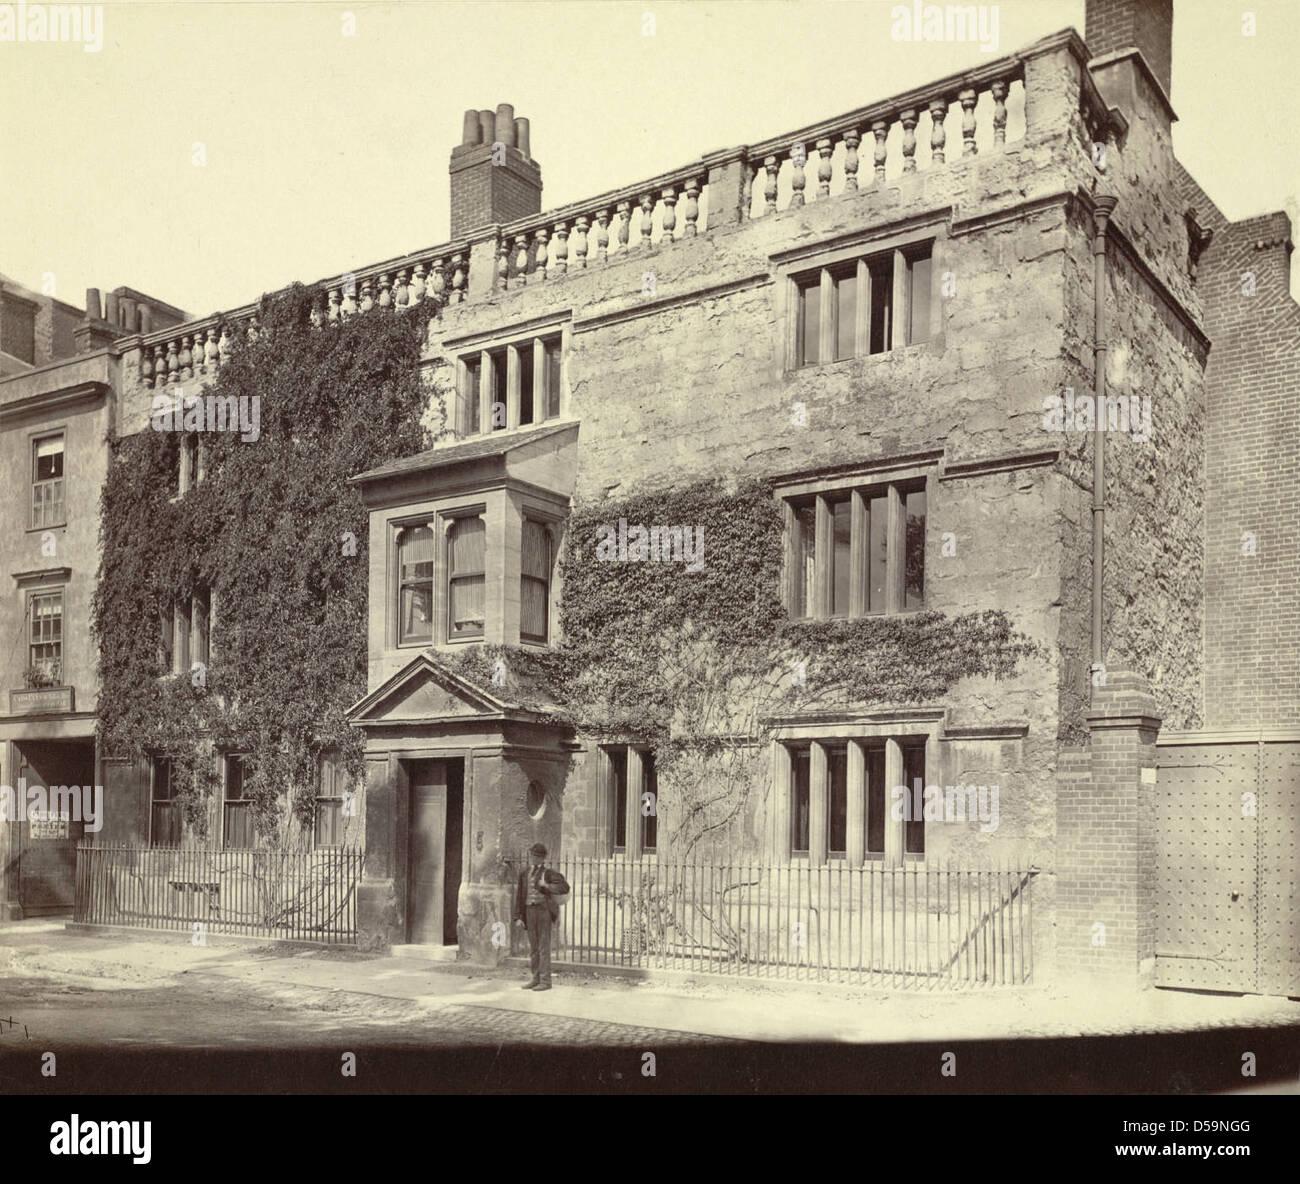 English Townhouse Stock Photo